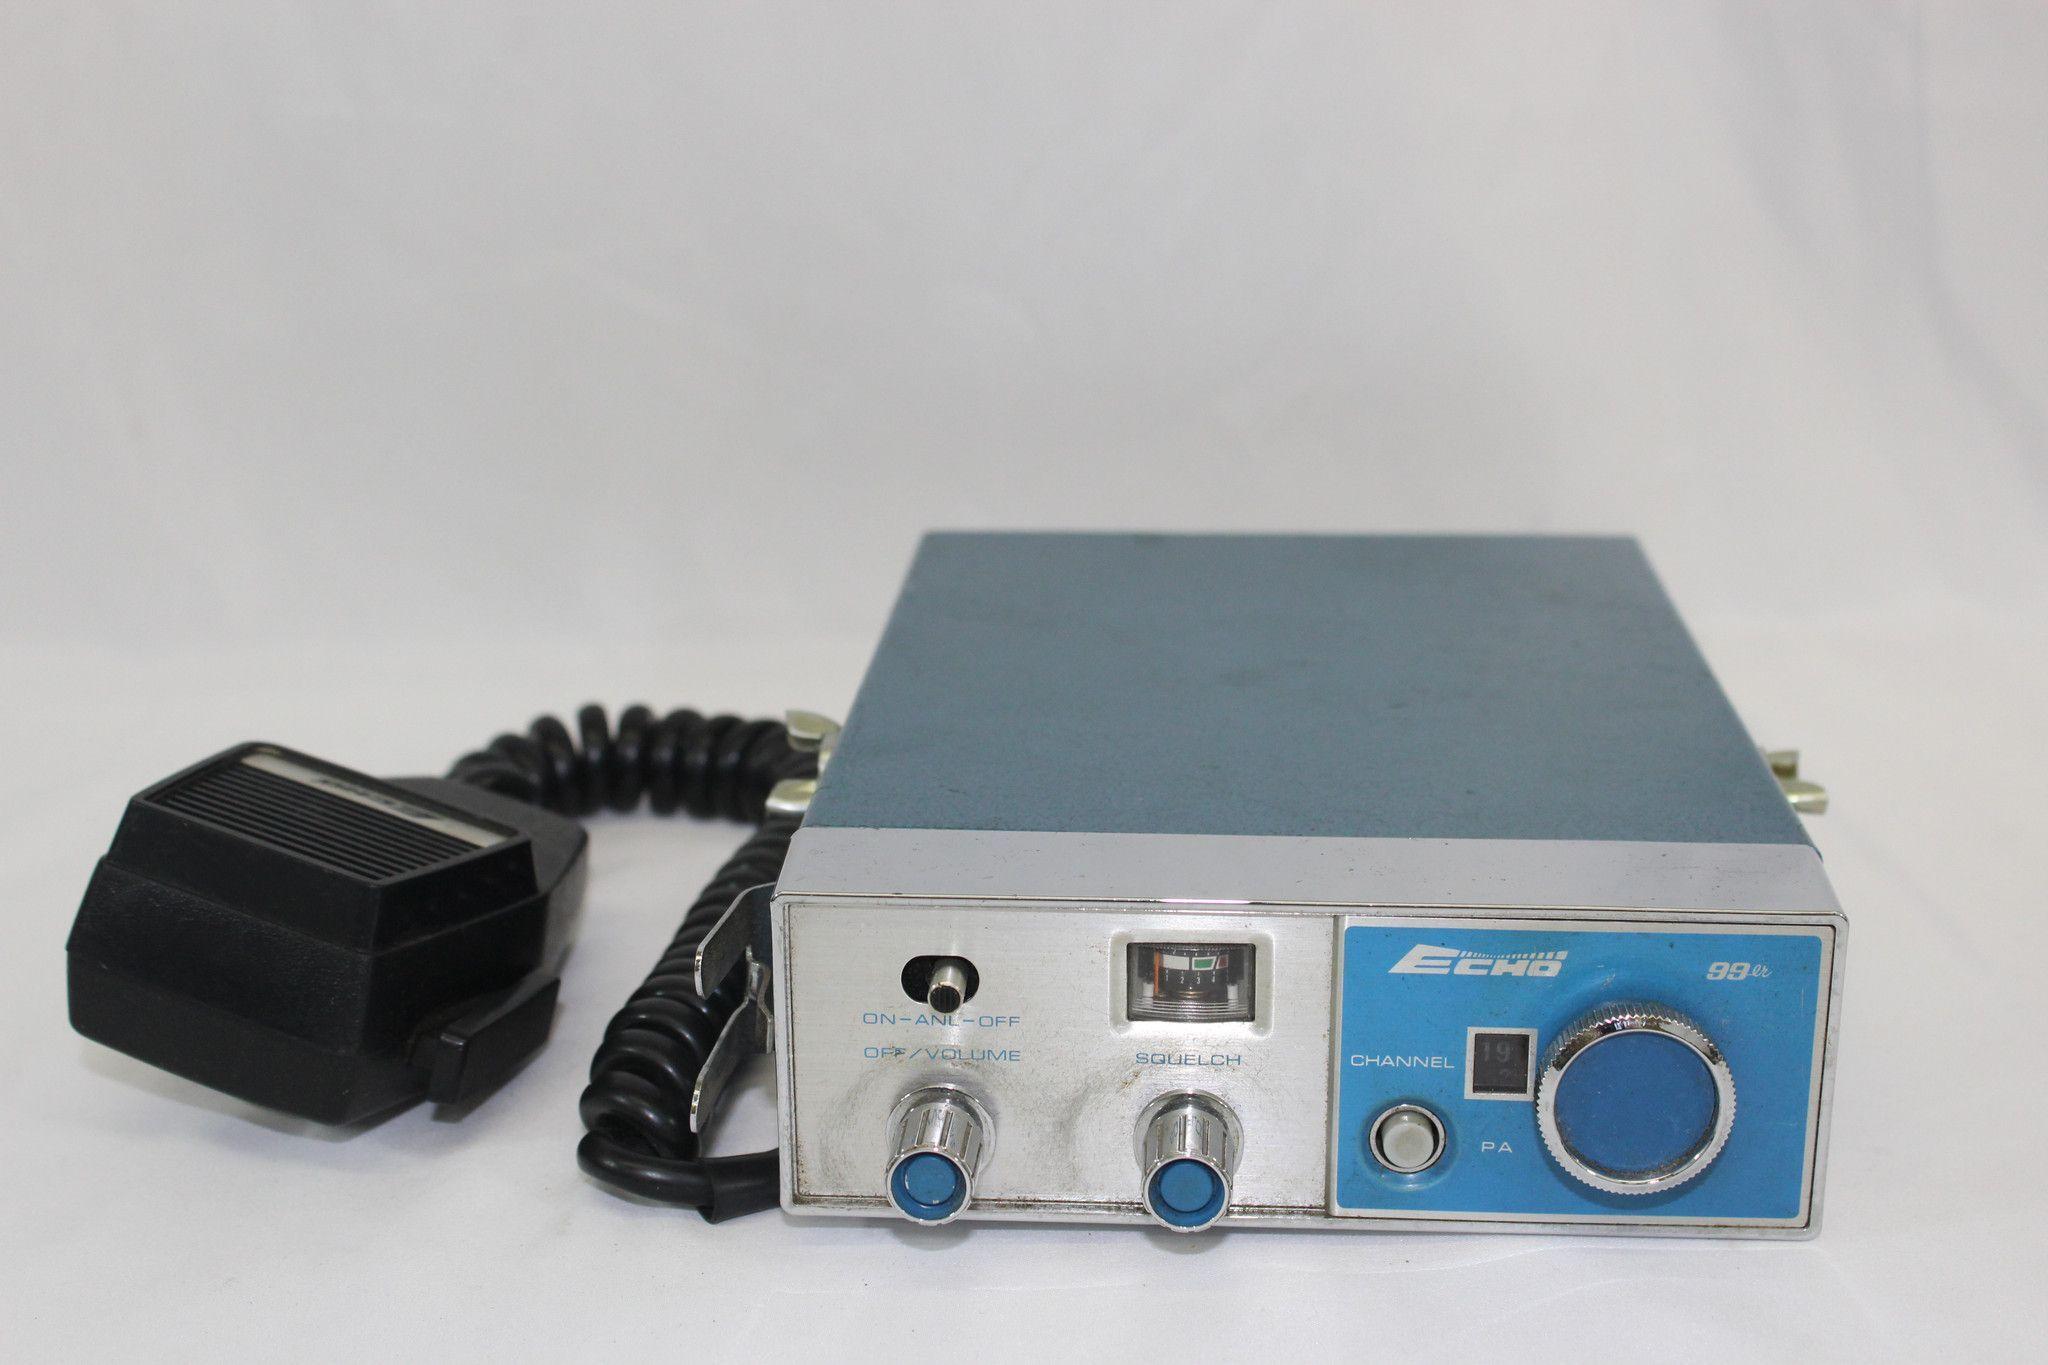 medium resolution of echo 99er cb radio 23 channel citizens band transceiver